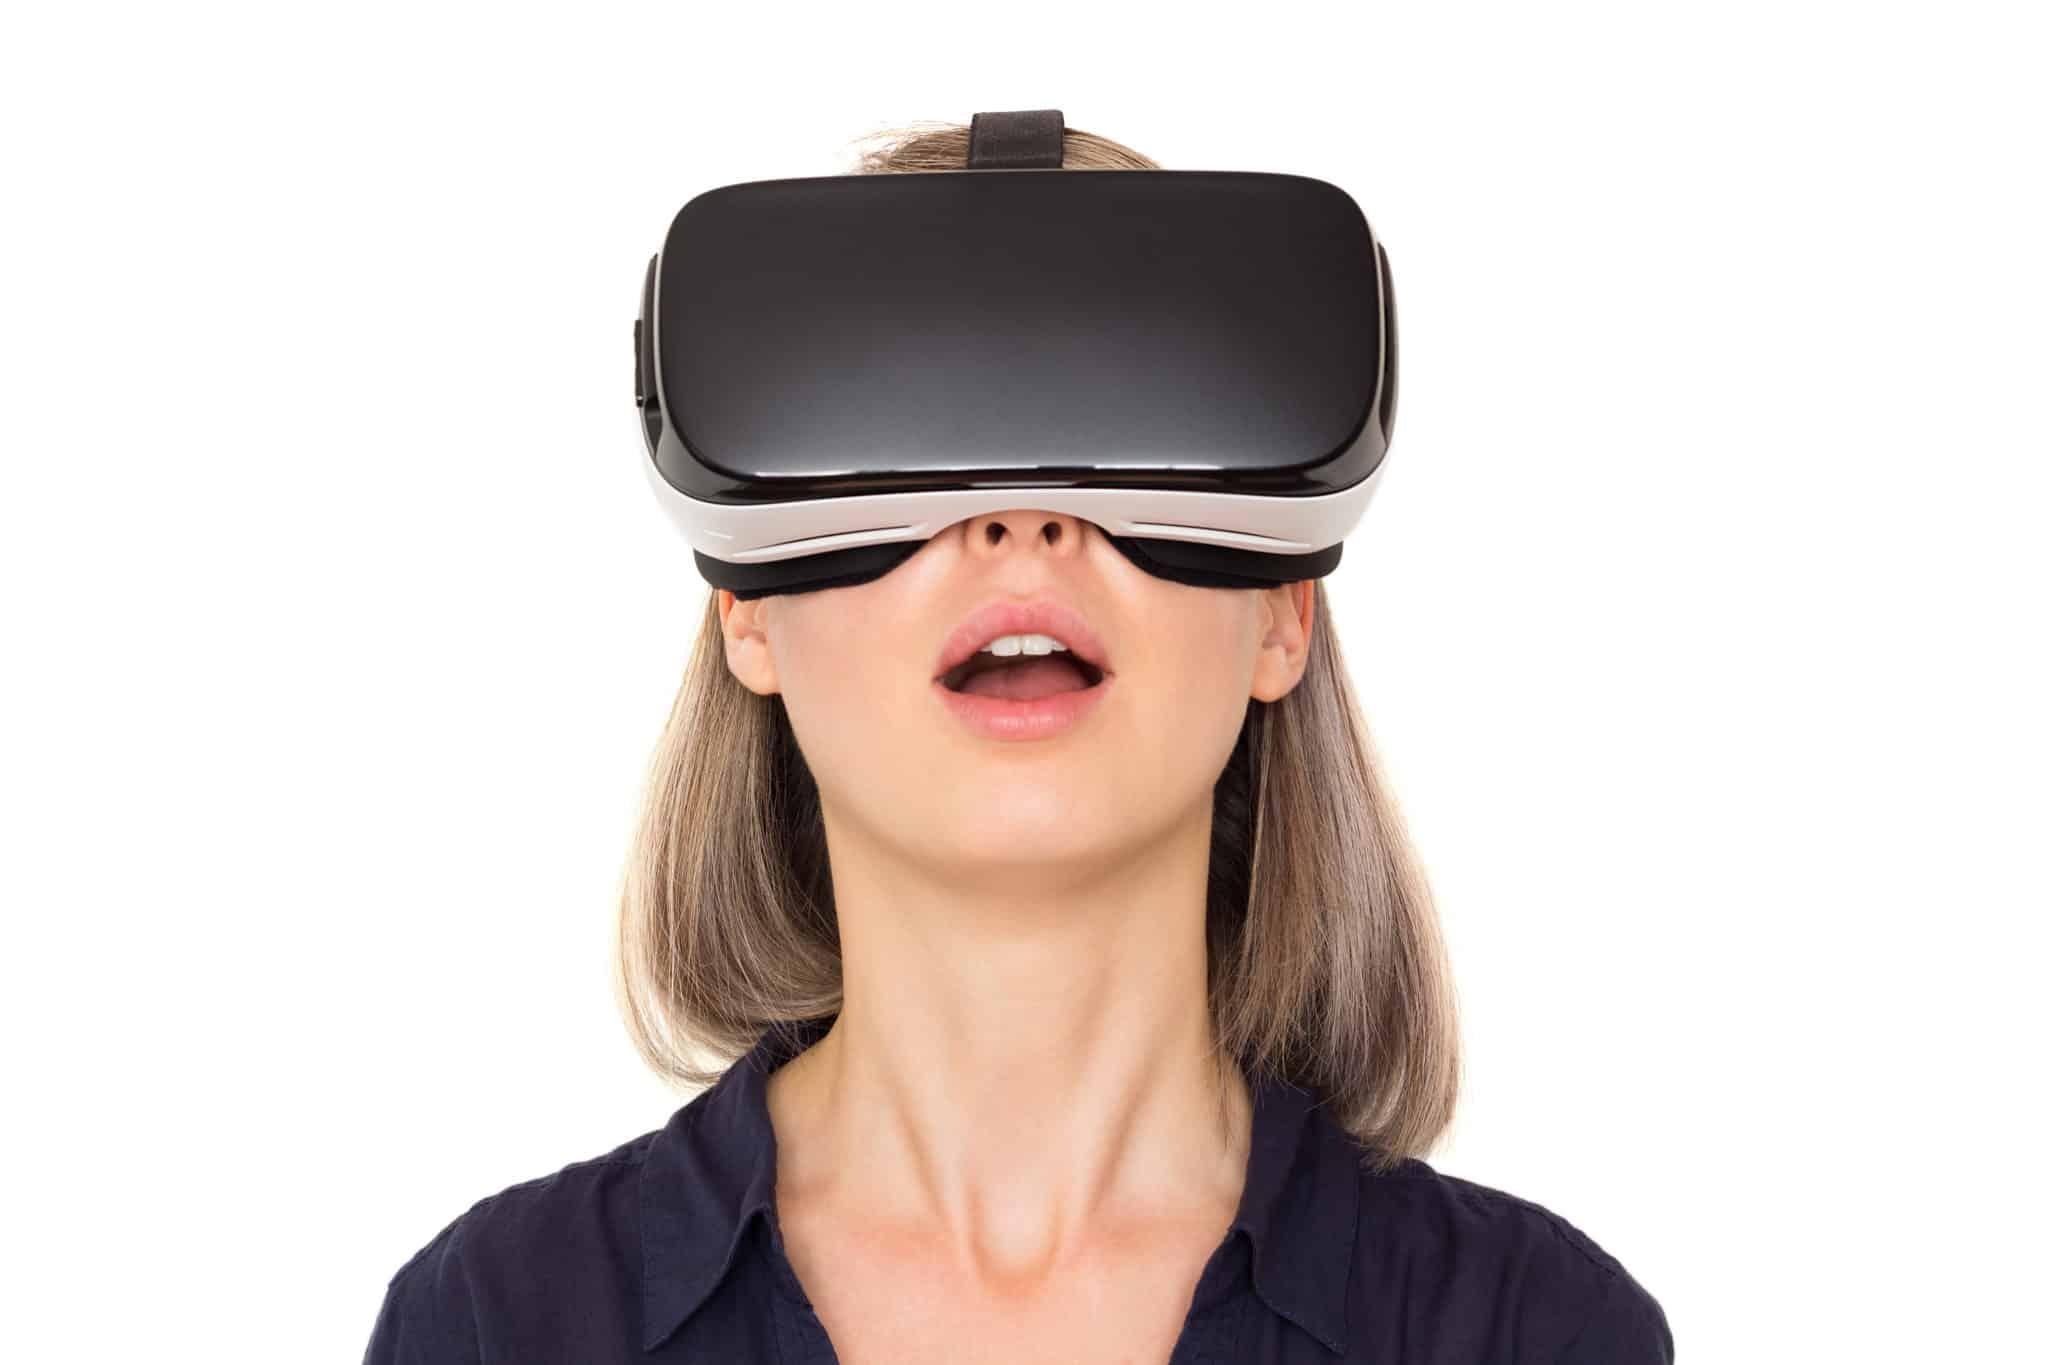 casque realite virtuelle auroch properties. Black Bedroom Furniture Sets. Home Design Ideas